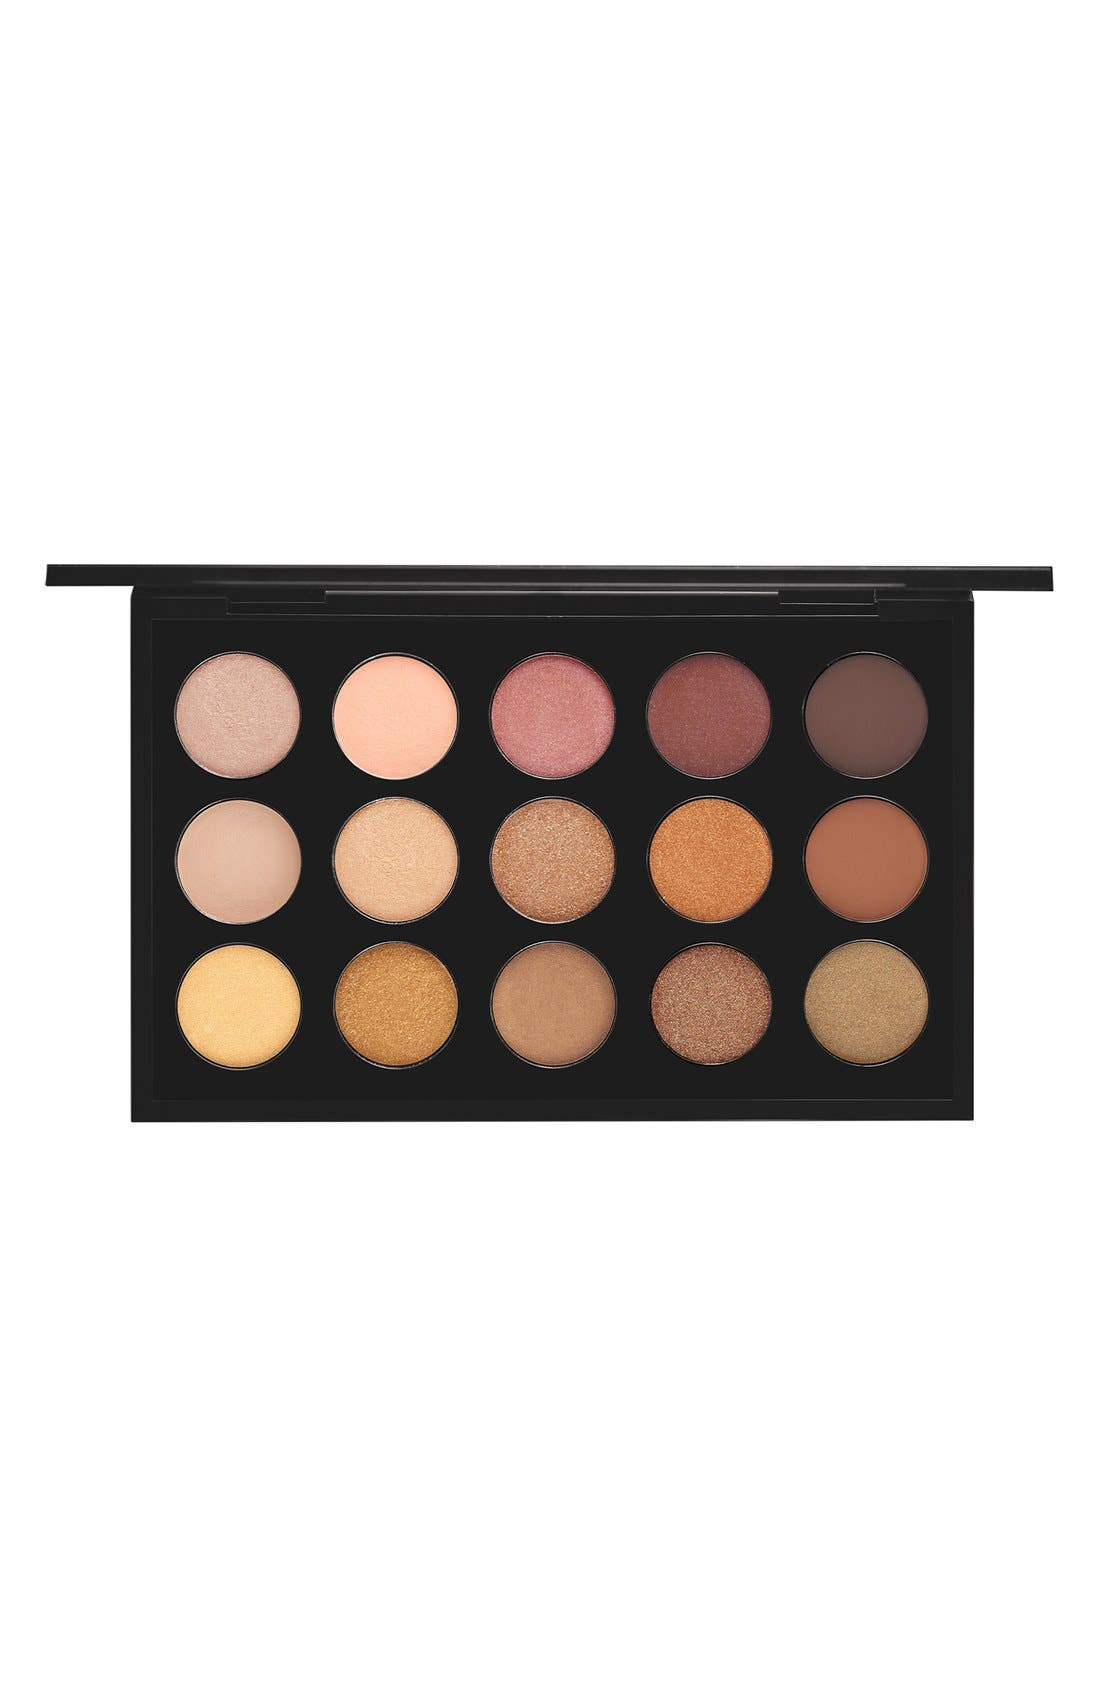 MAC Warm Neutral Times 15 Eyeshadow Palette,                         Main,                         color, Warm Neutral